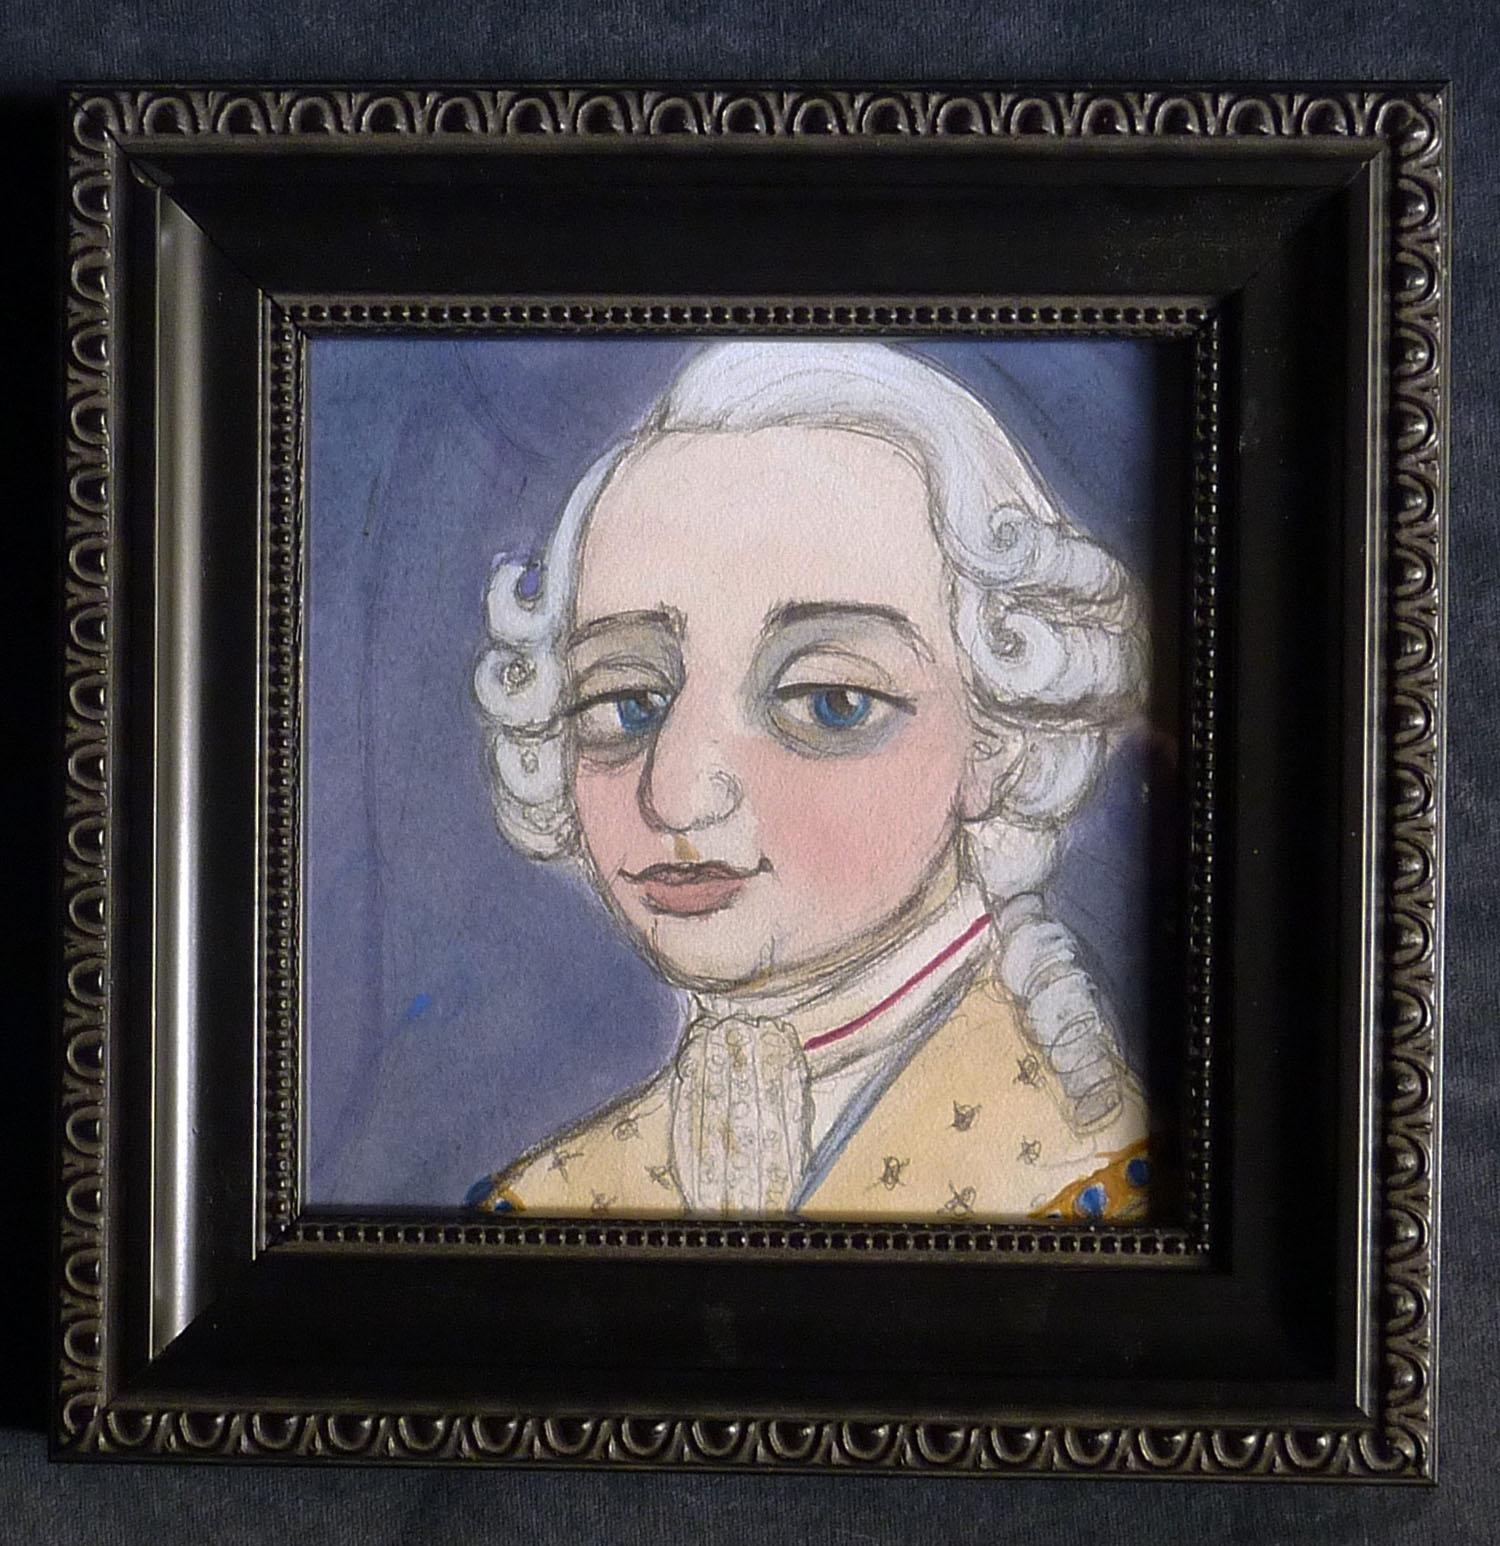 Louis XVI, Last King of France